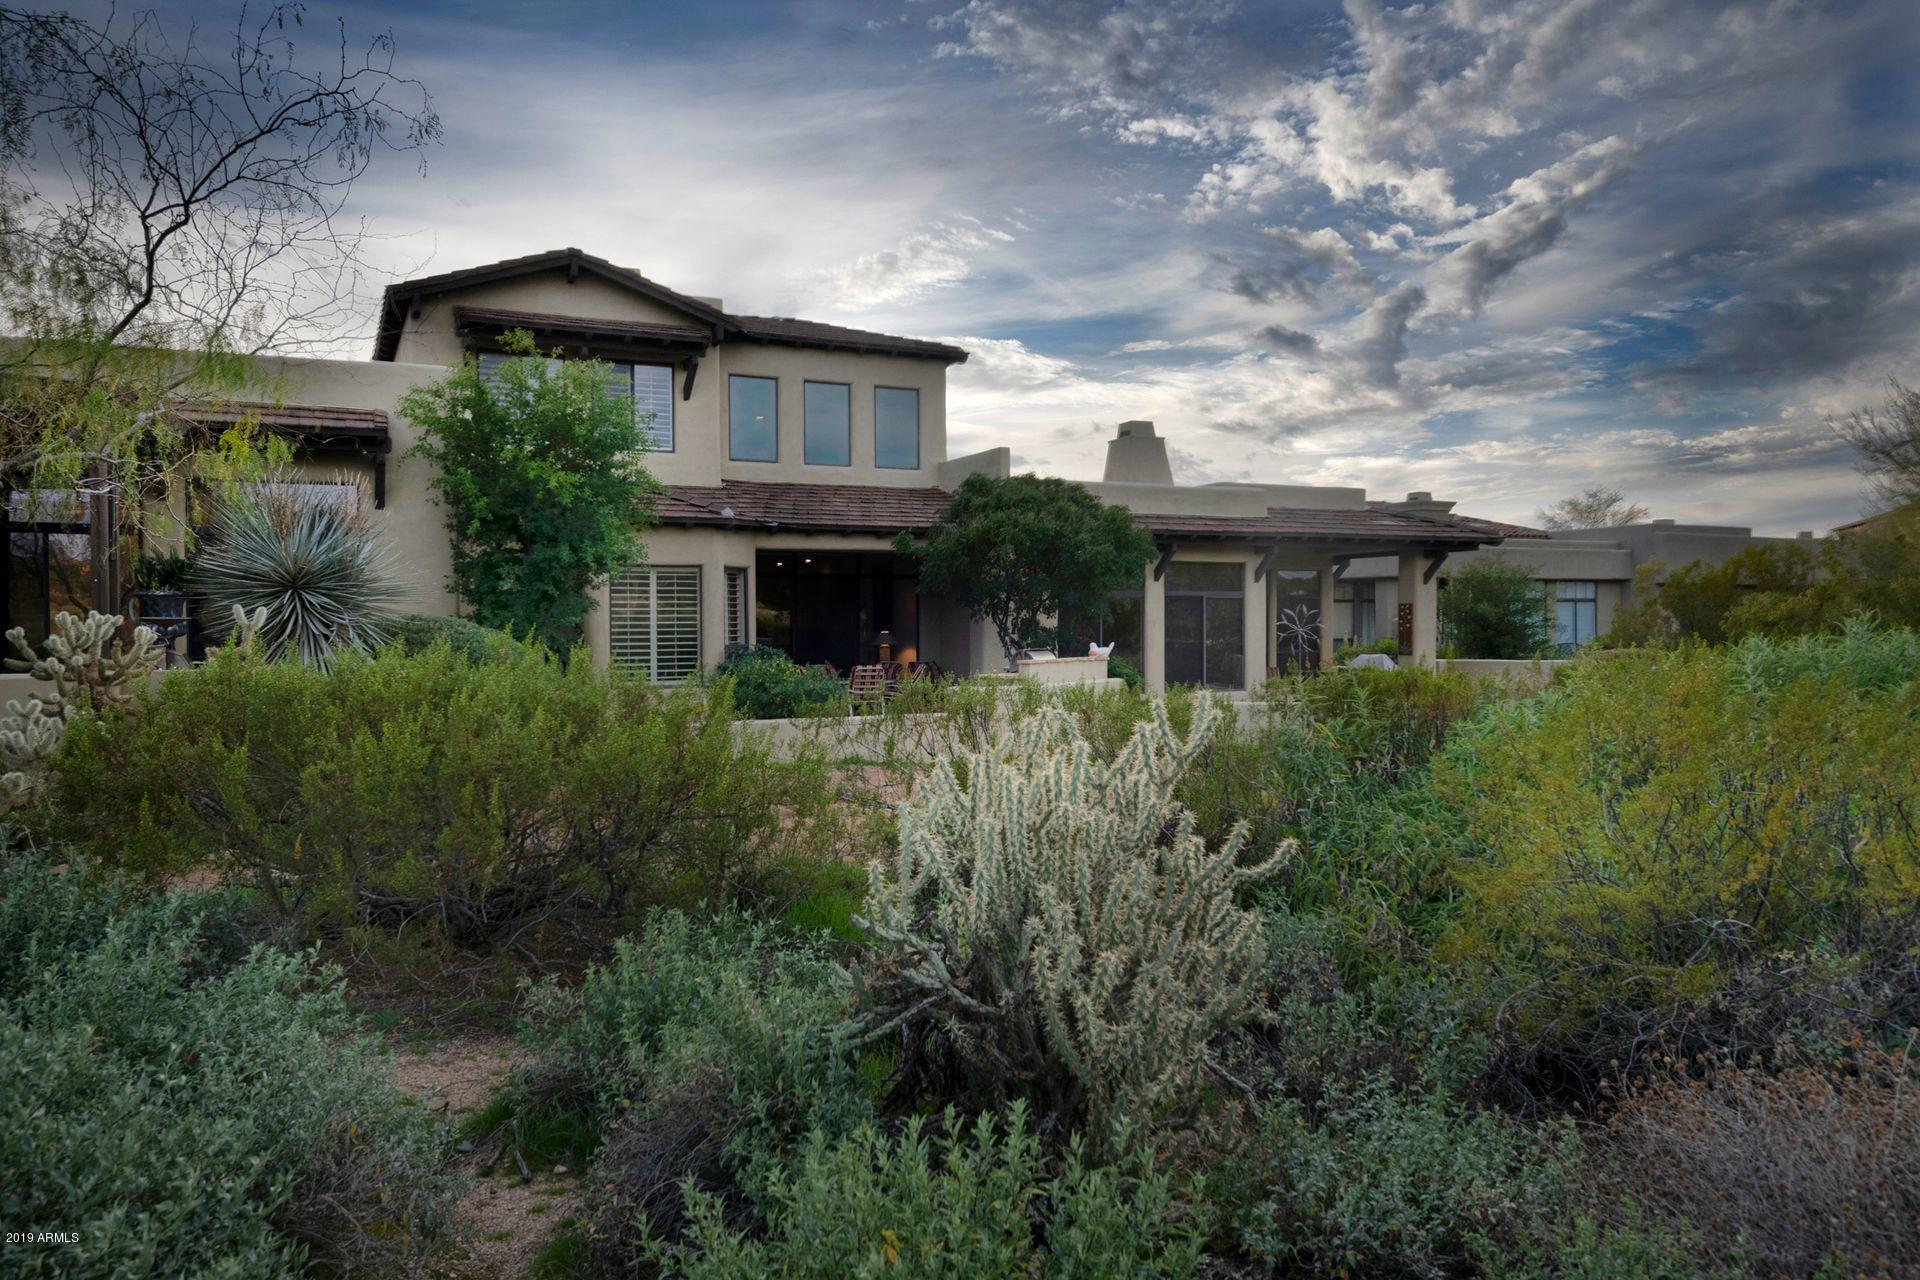 Photo of 9270 E THOMPSON PEAK Parkway #340, Scottsdale, AZ 85255